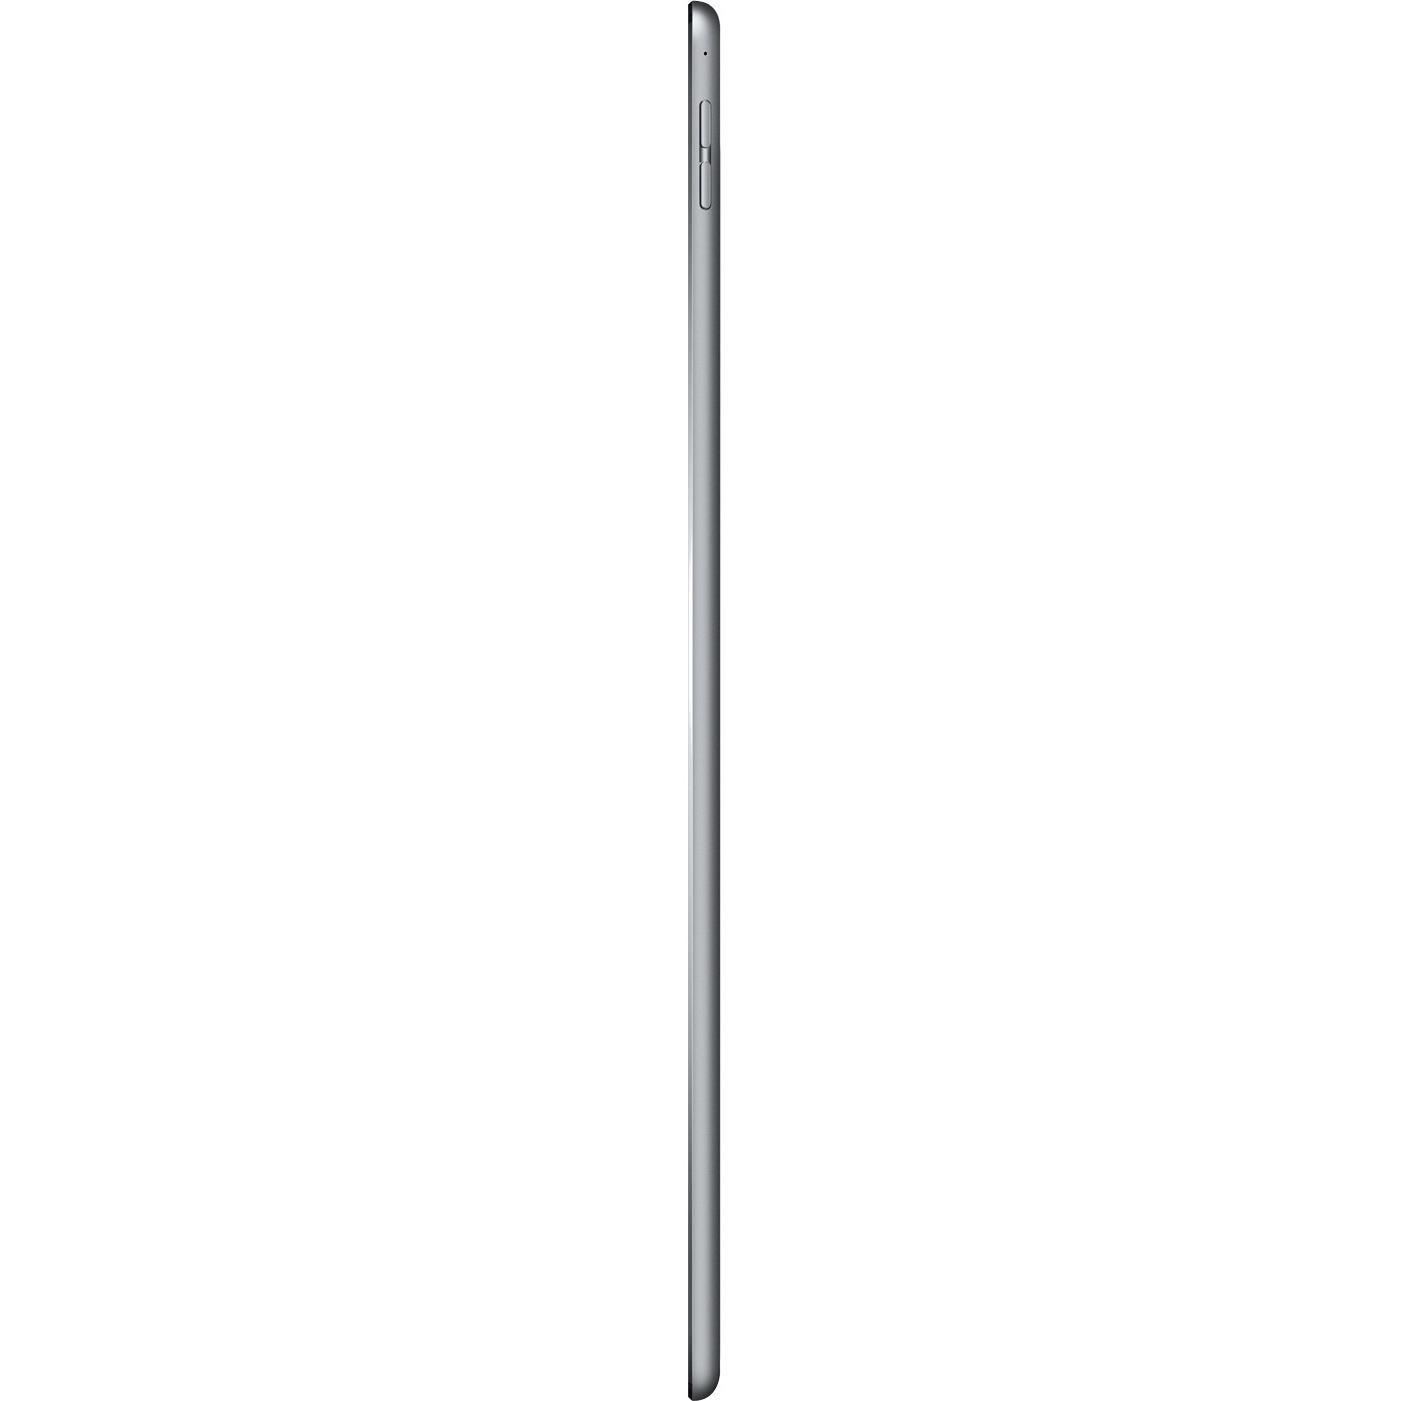 Apple iPad Pro Tablet - 32.8 cm 12.9inch - Apple A10X Hexa-core 6 Core - 512 GB - iOS 10 - 2732 x 2048 - Retina Display - Space Gray - Wireless LAN - Bluetooth - Li